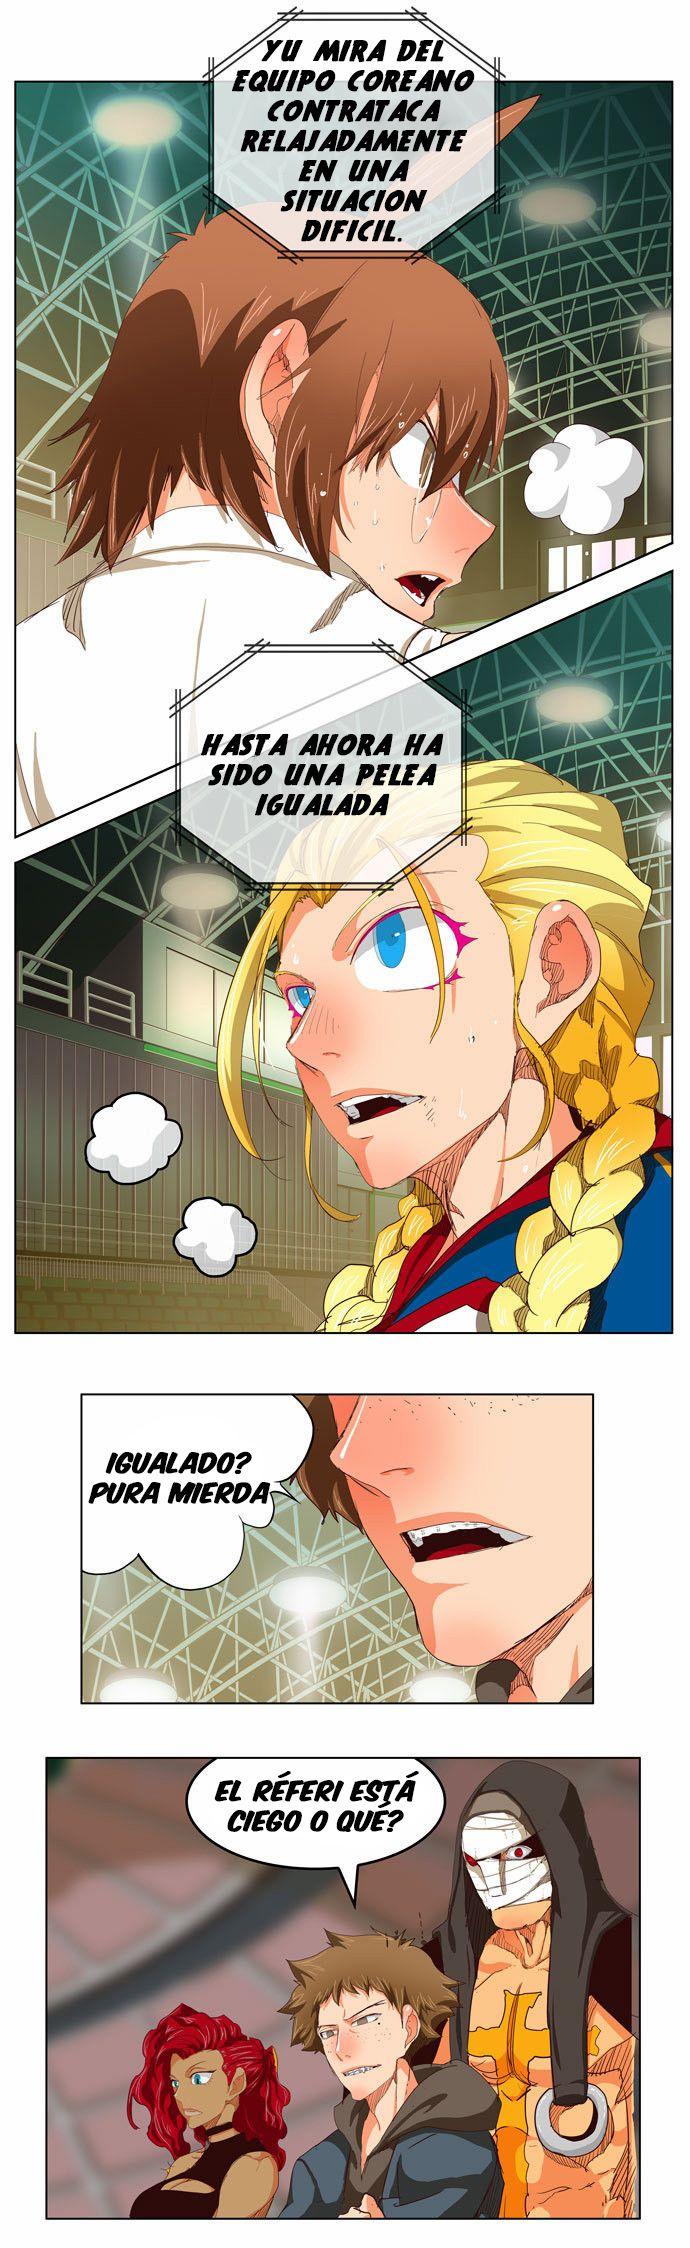 http://c5.ninemanga.com/es_manga/37/485/454638/e9d318e495563c9ee2bdf6a81b2d052b.jpg Page 5